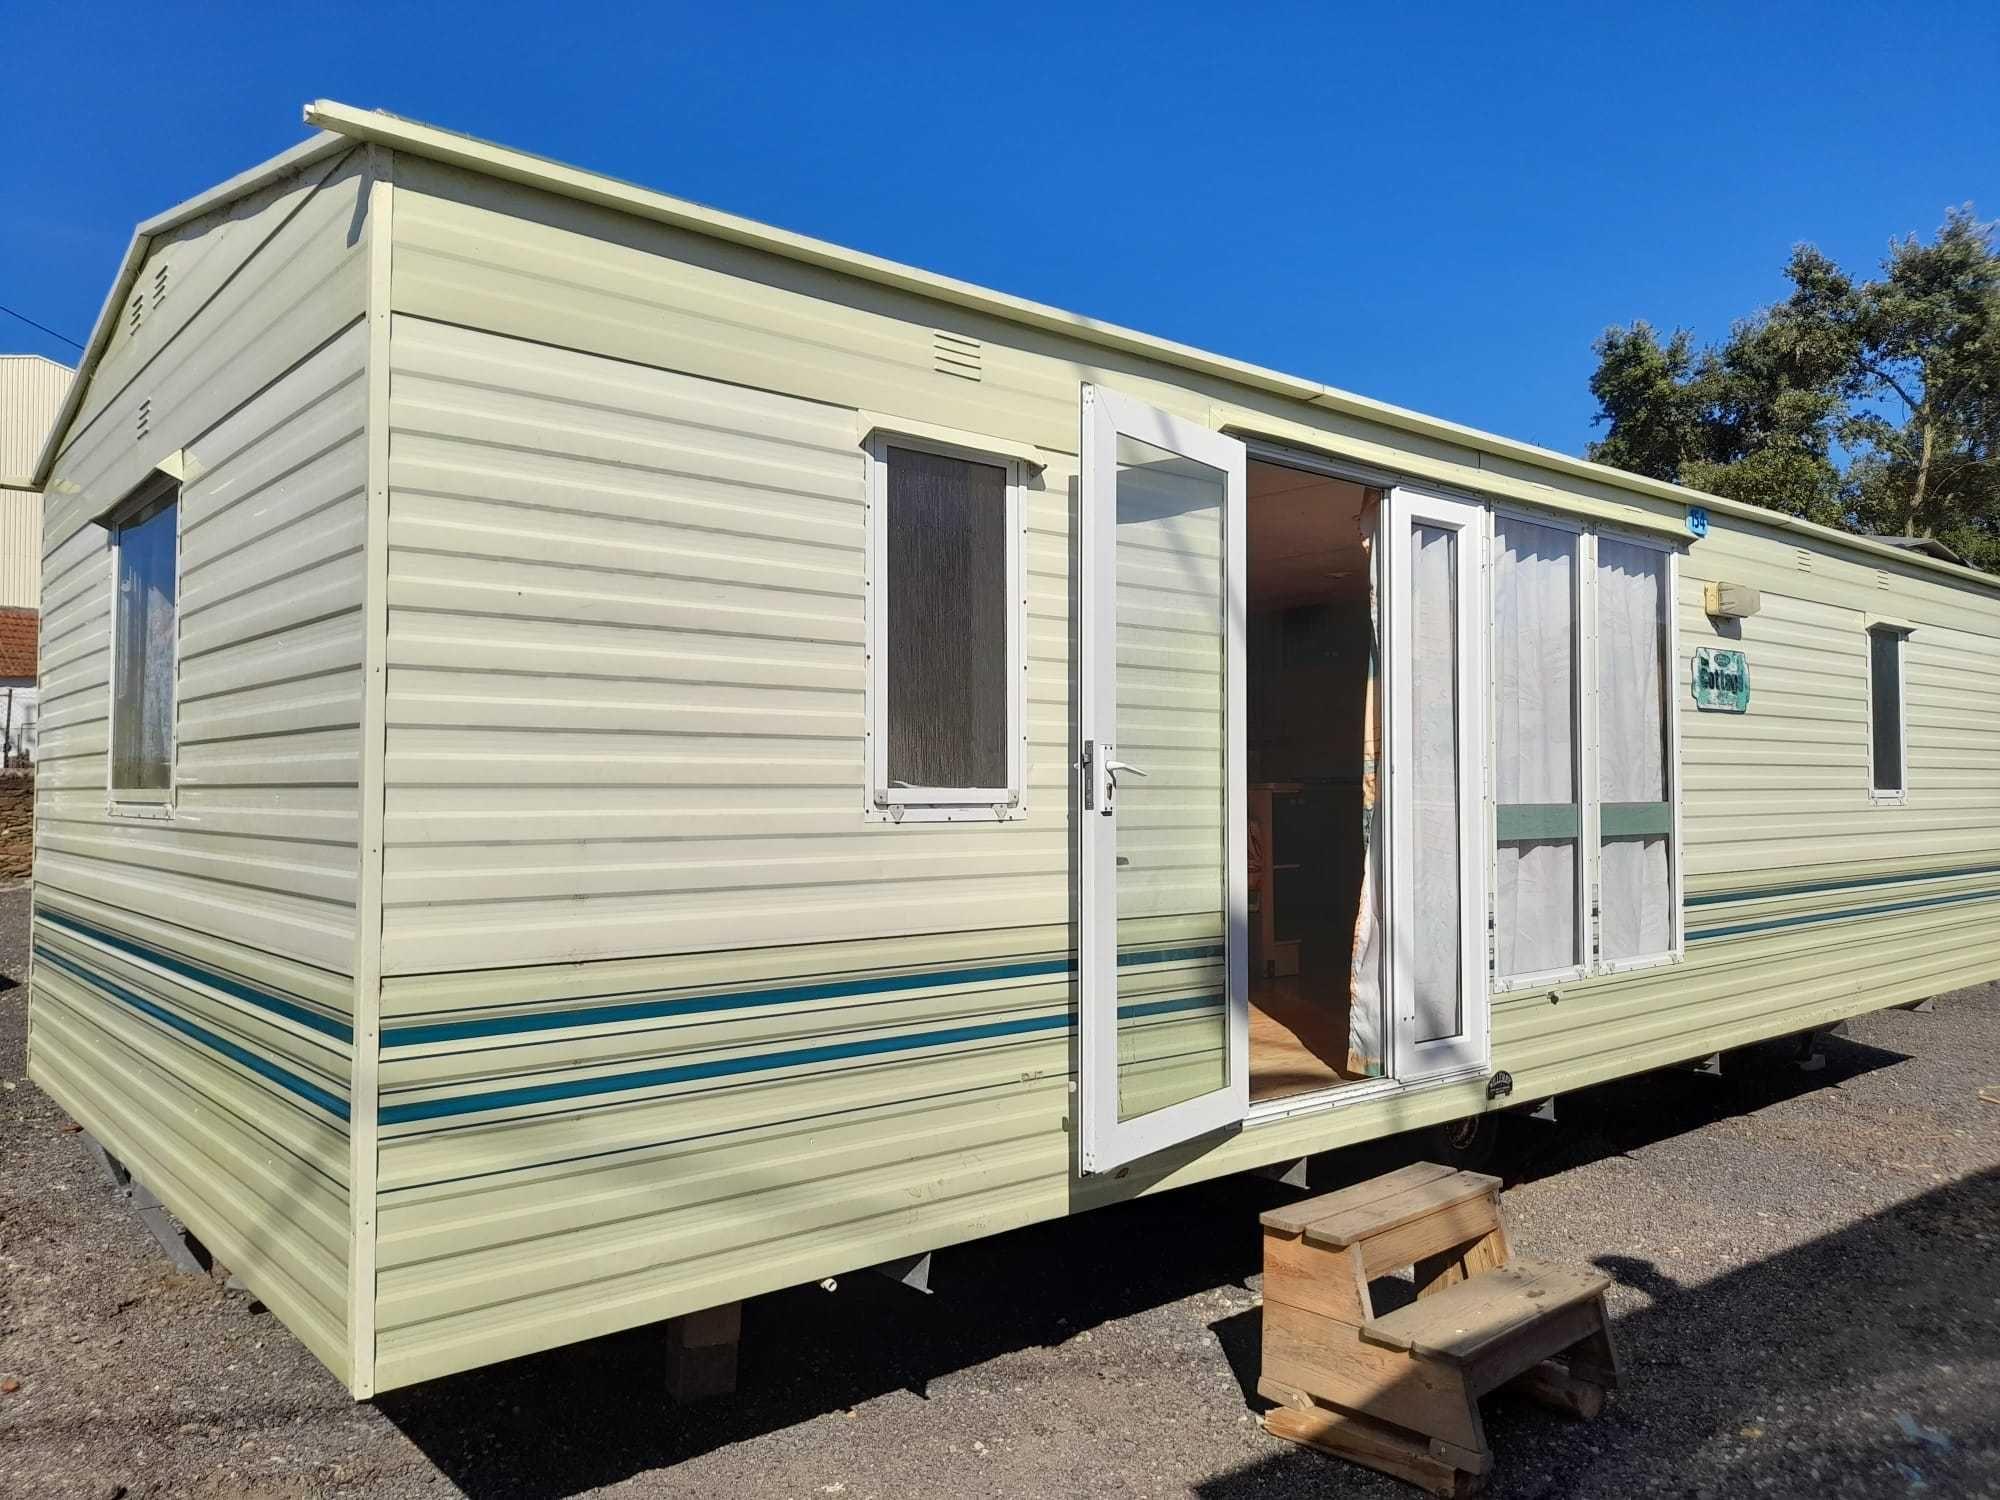 Casa Móvel / Mobile Home Nº 1031 WILLERBY COTTAGE 860 T2 8,6x4m